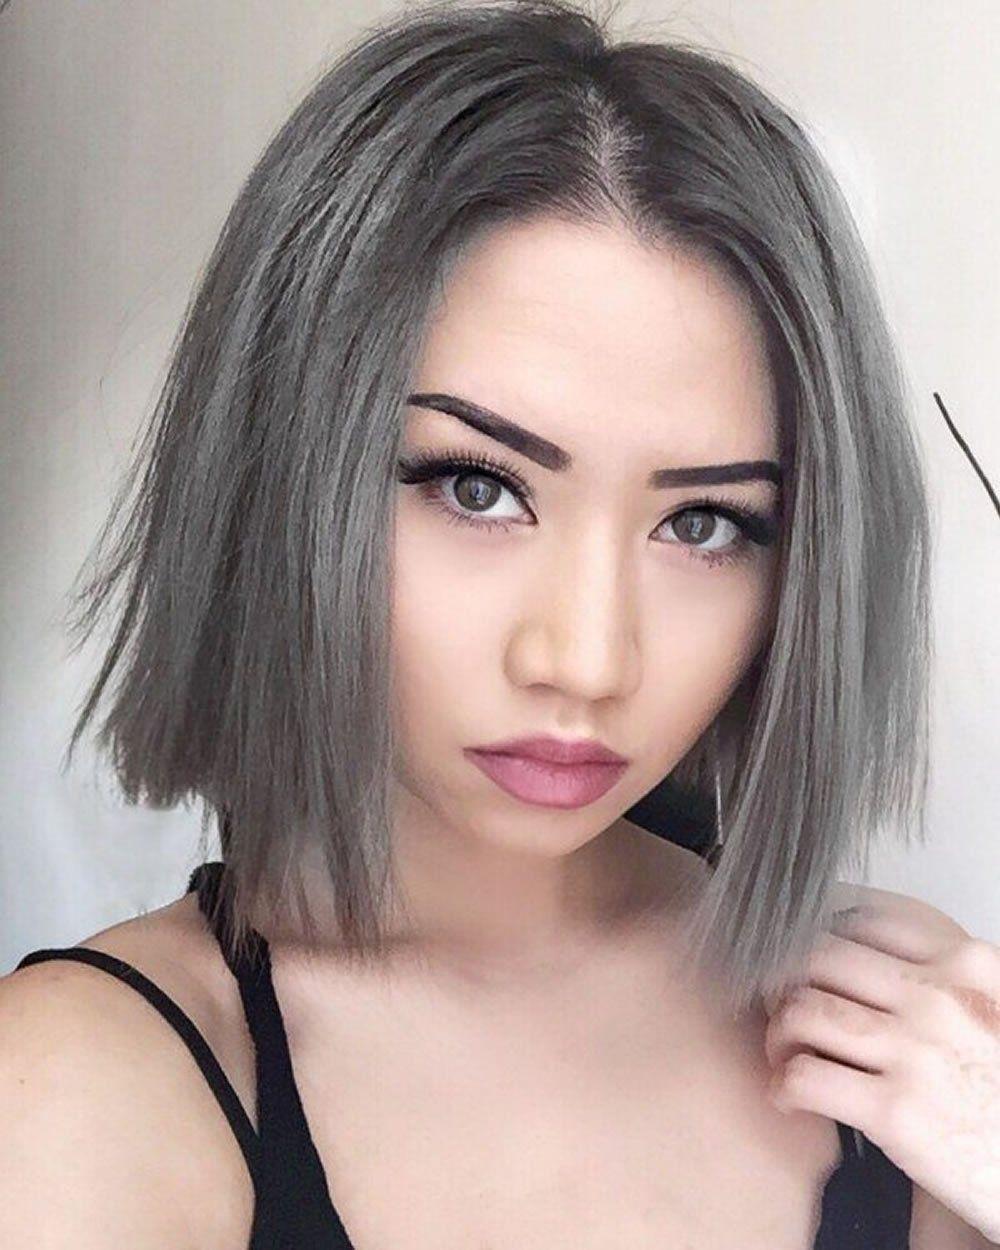 Short bob haircut & Hair color ideas for 2018 Grey hair